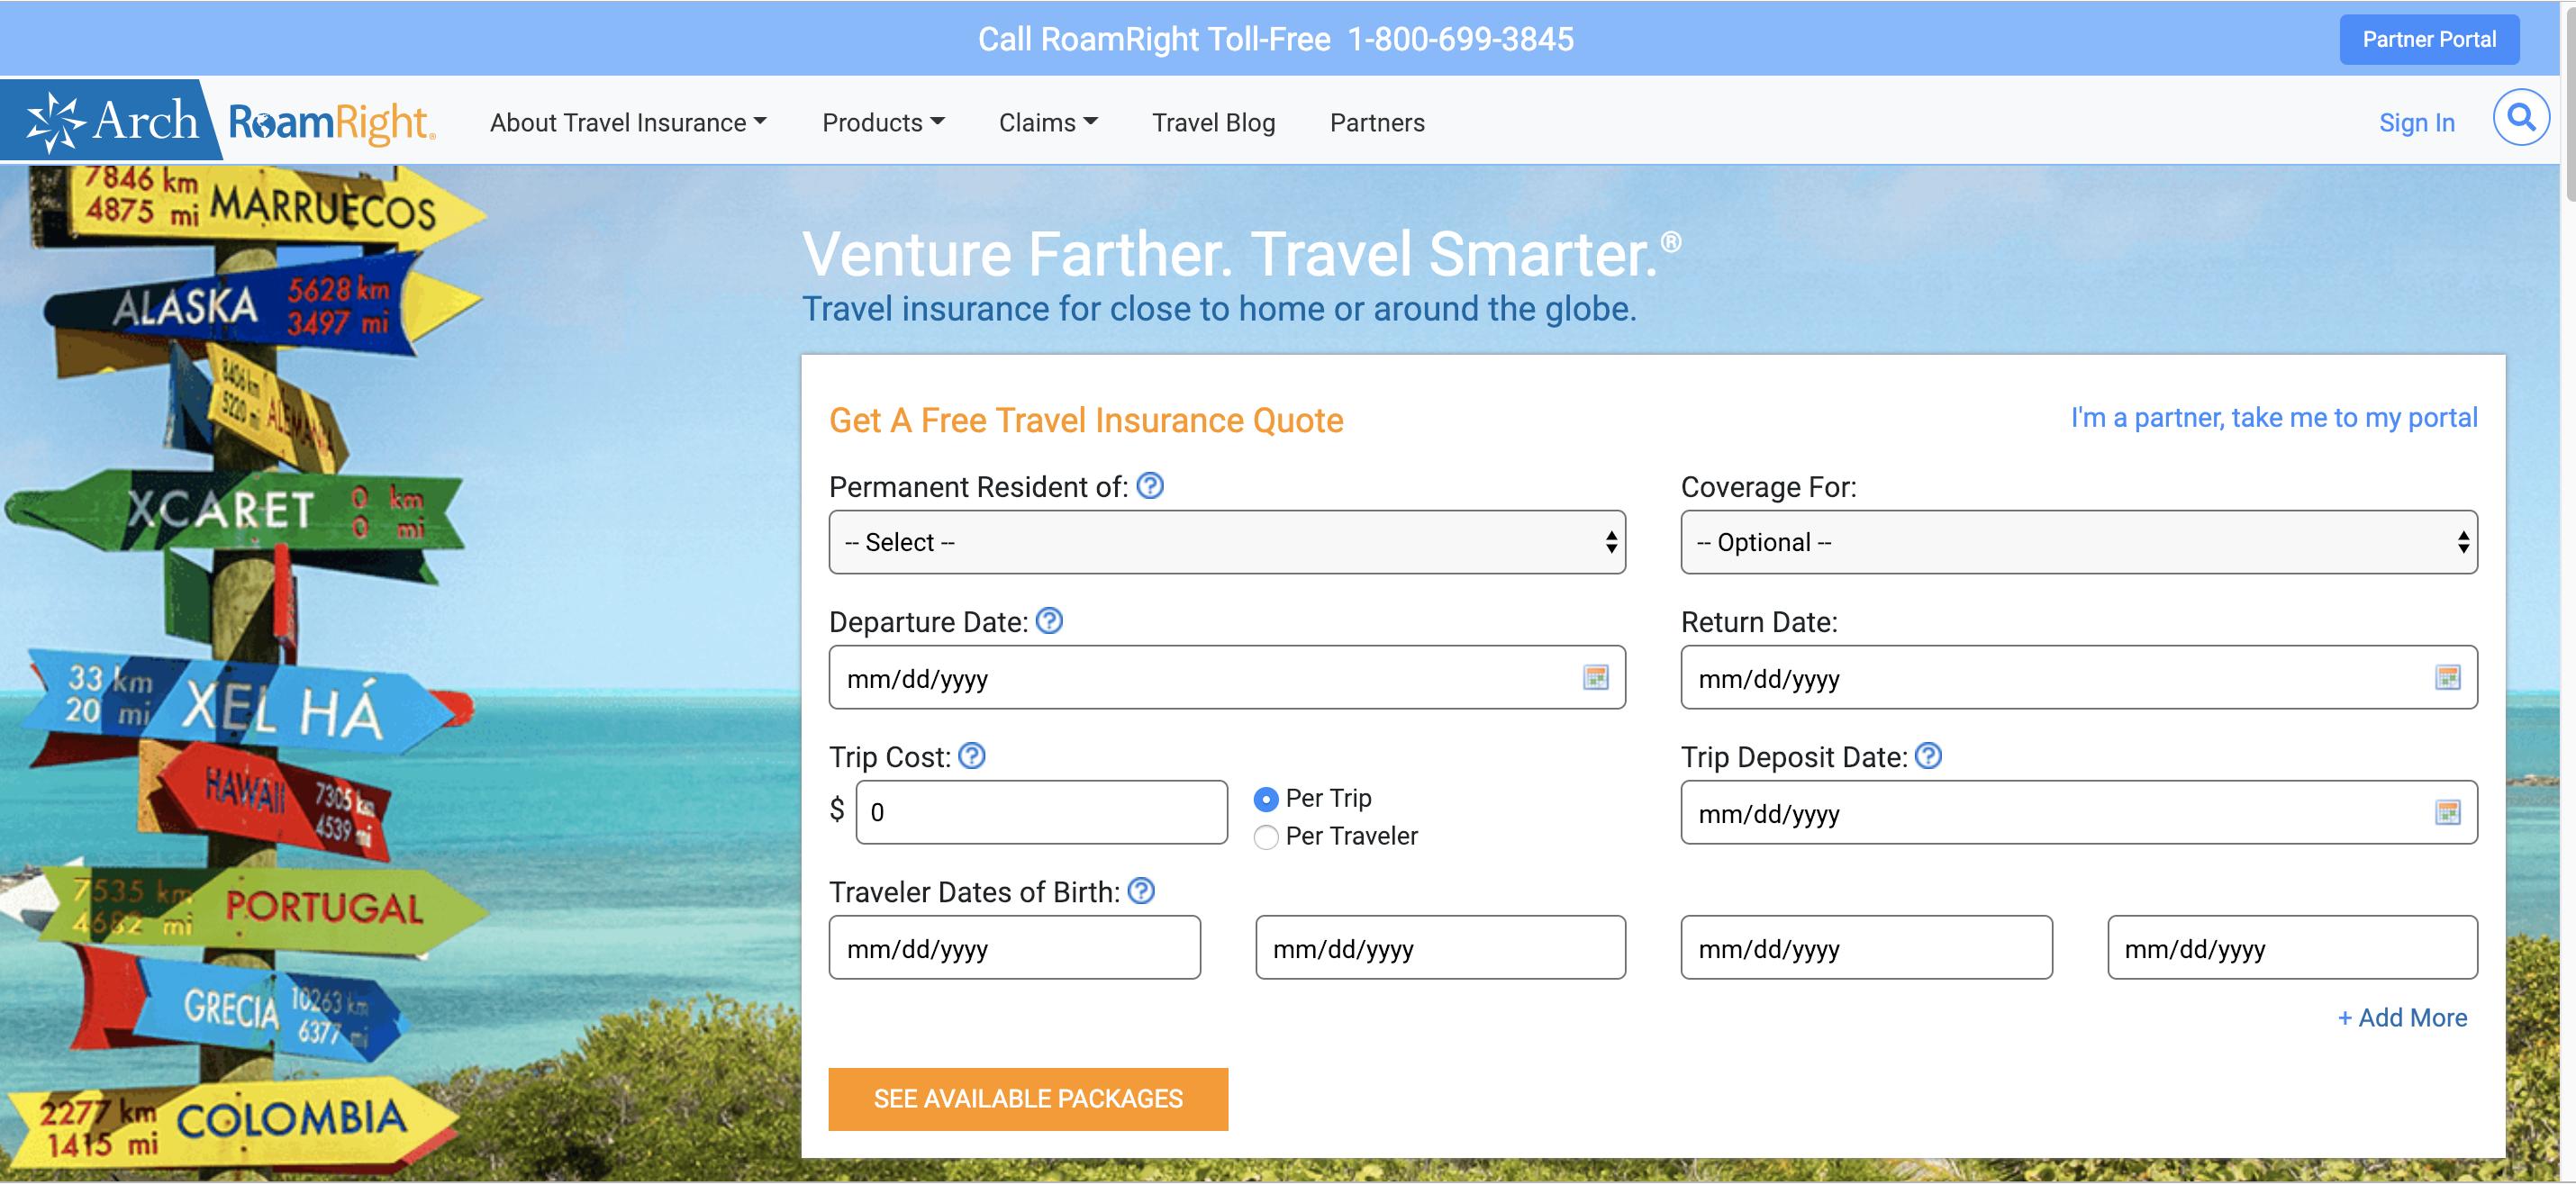 roamright travel insurance review